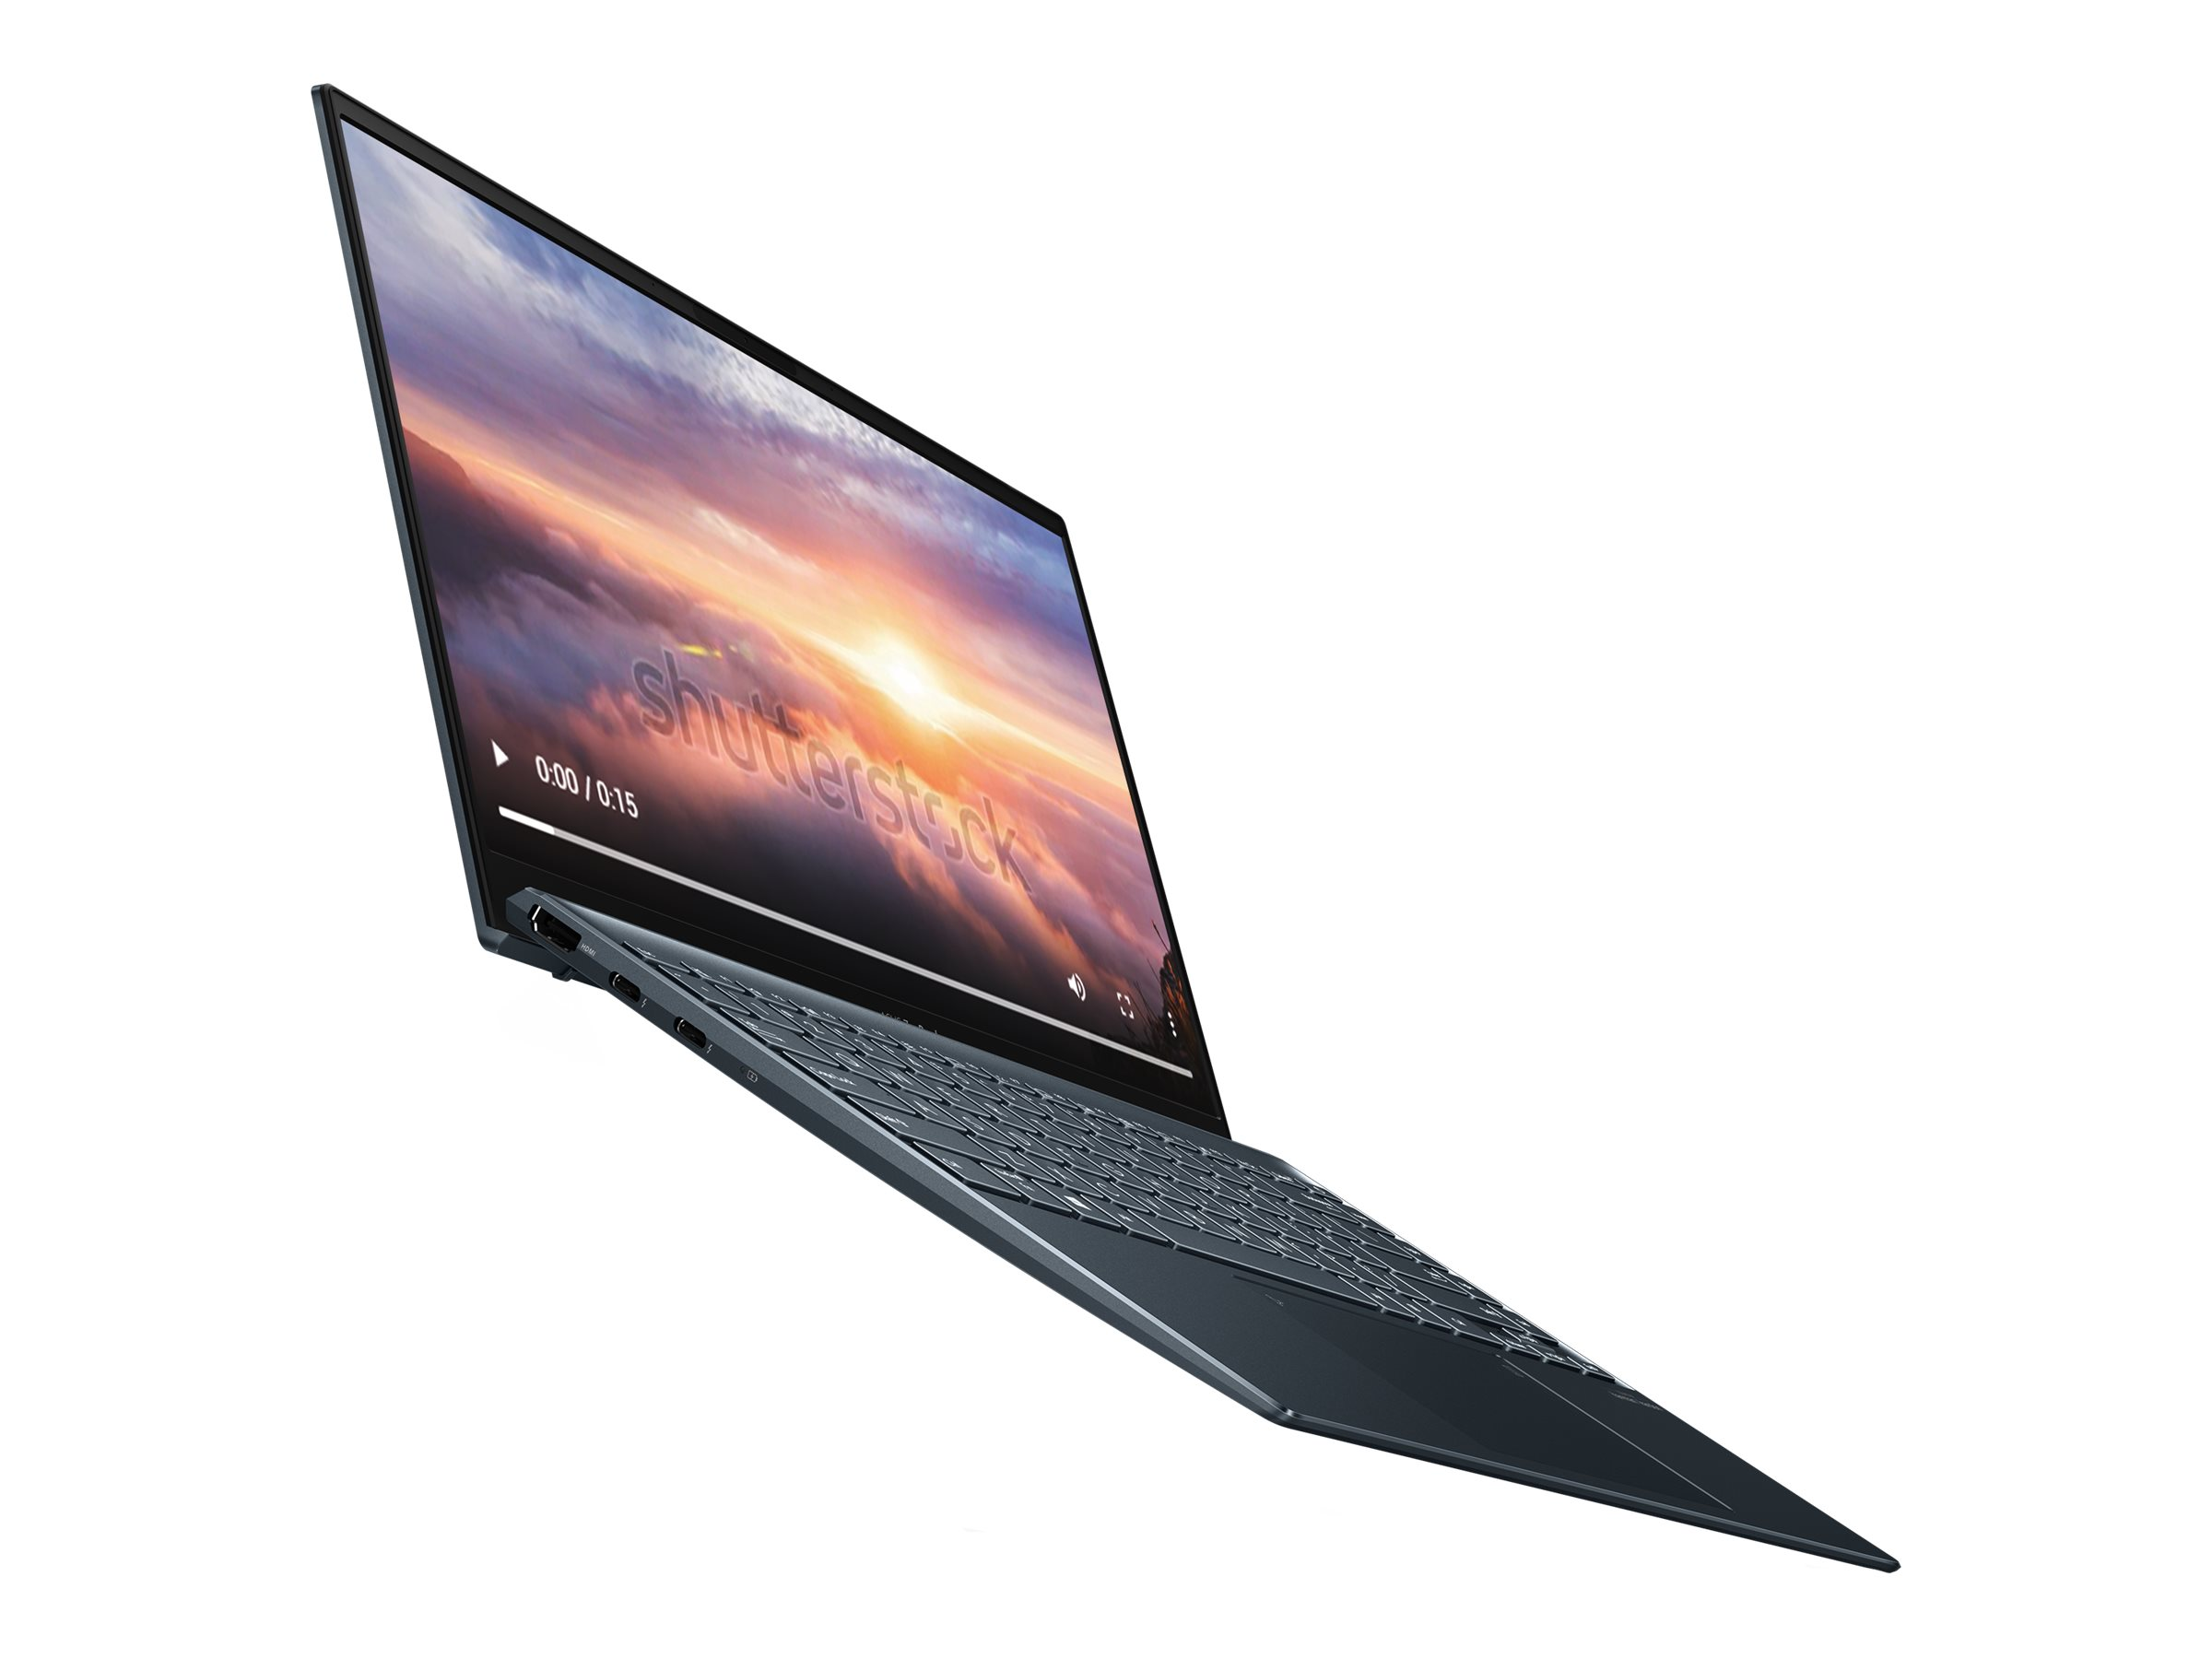 "ASUS ZenBook 14 UX425JA-HM026R - Core i5 1035G1 / 1 GHz - Win 10 Pro 64-Bit - 8 GB RAM - 512 GB SSD NVMe - 35.6 cm (14"")"